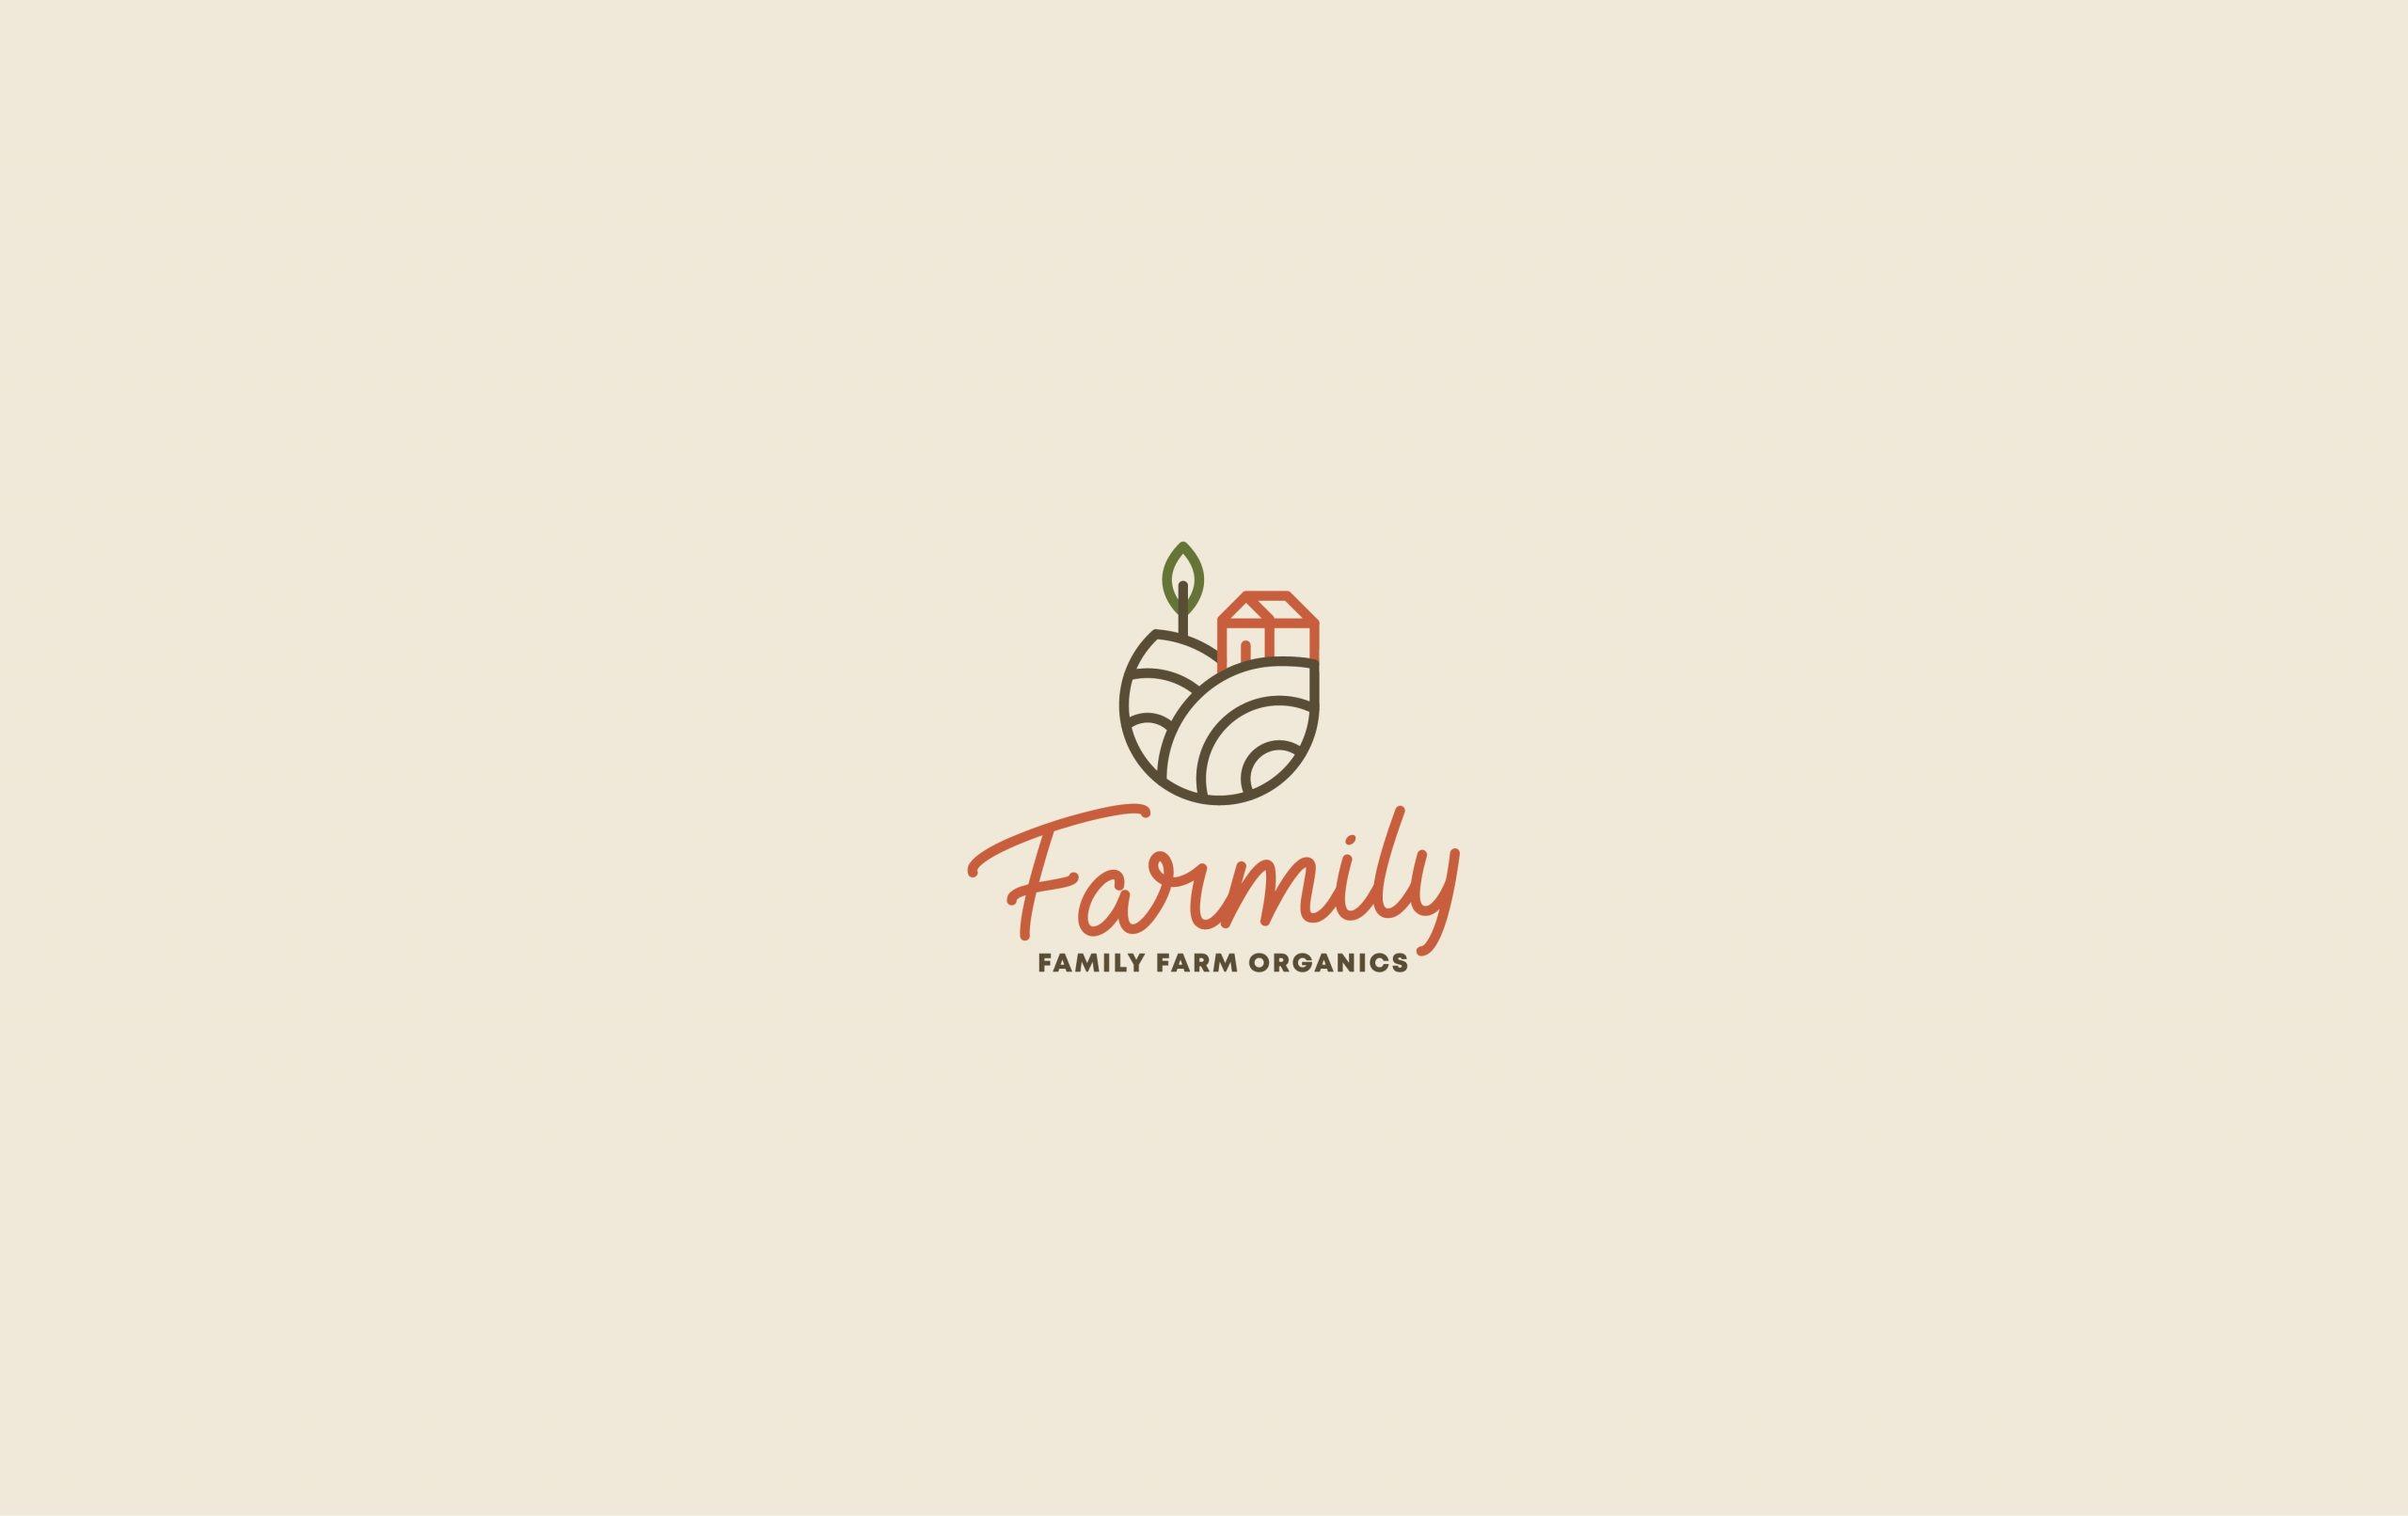 Farmily